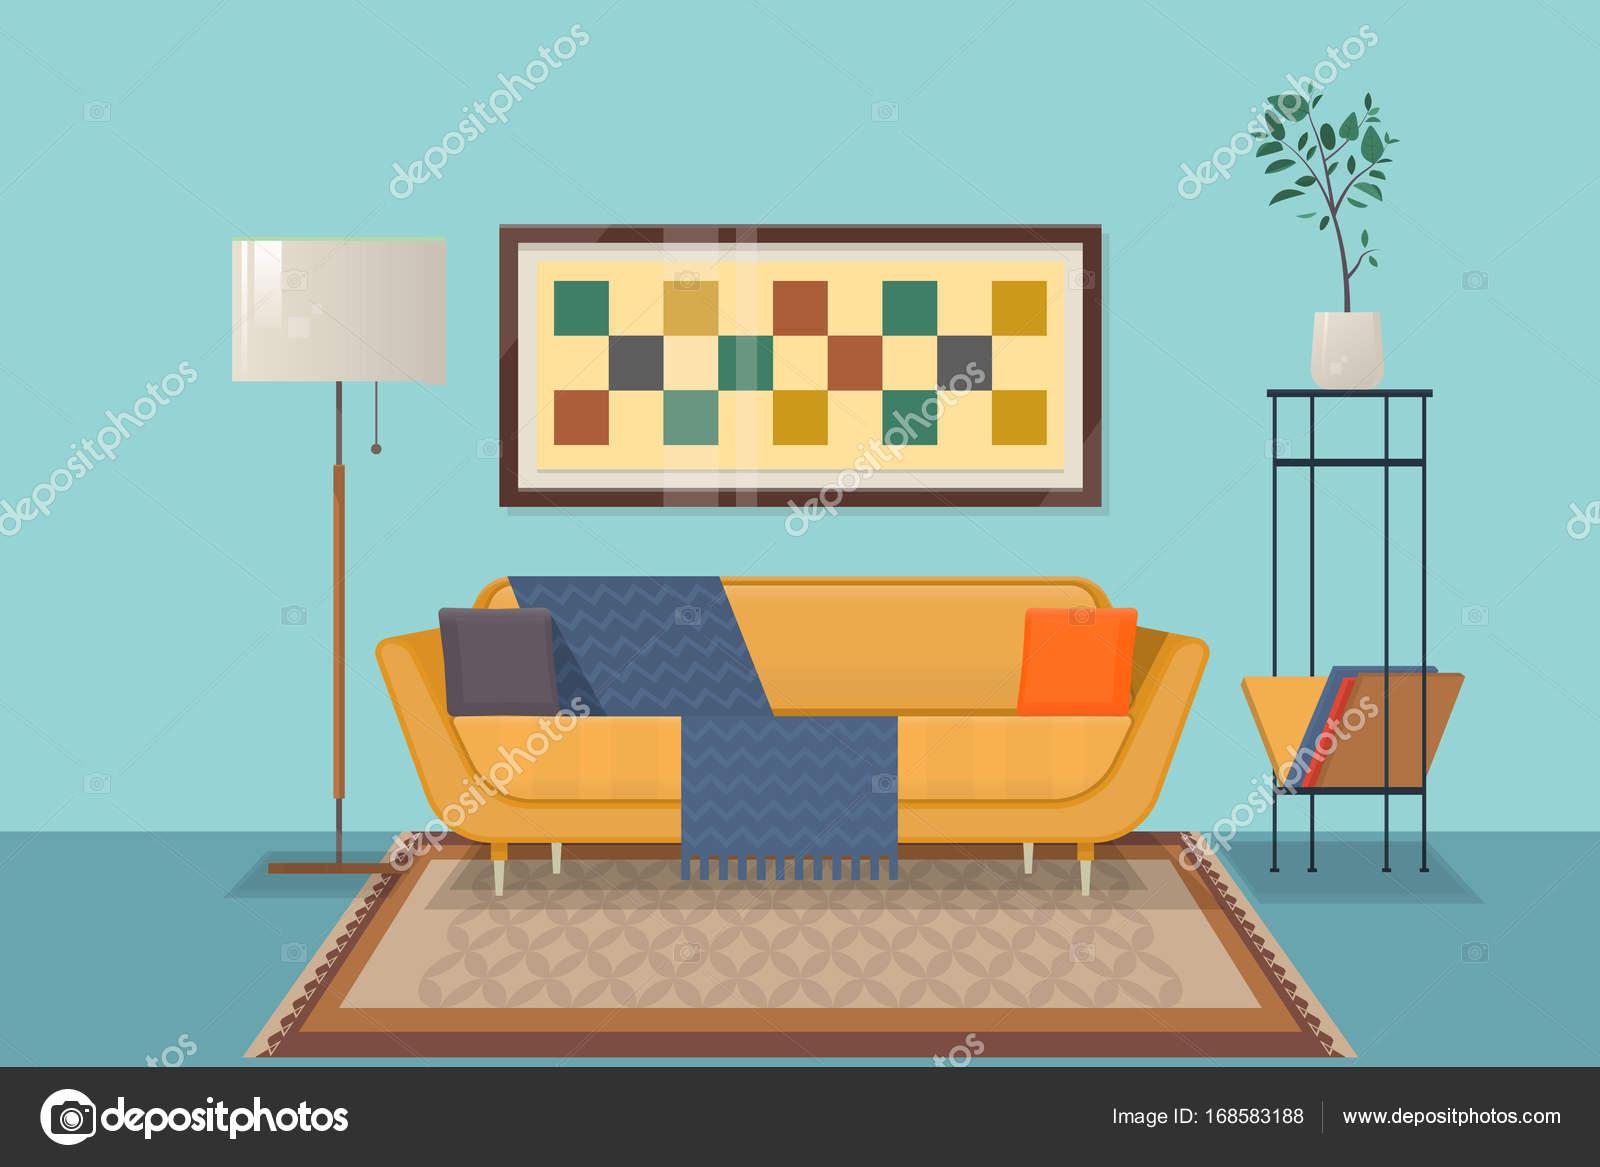 Diseño de interiores de sala de estar con muebles de ouch, almohadas ...